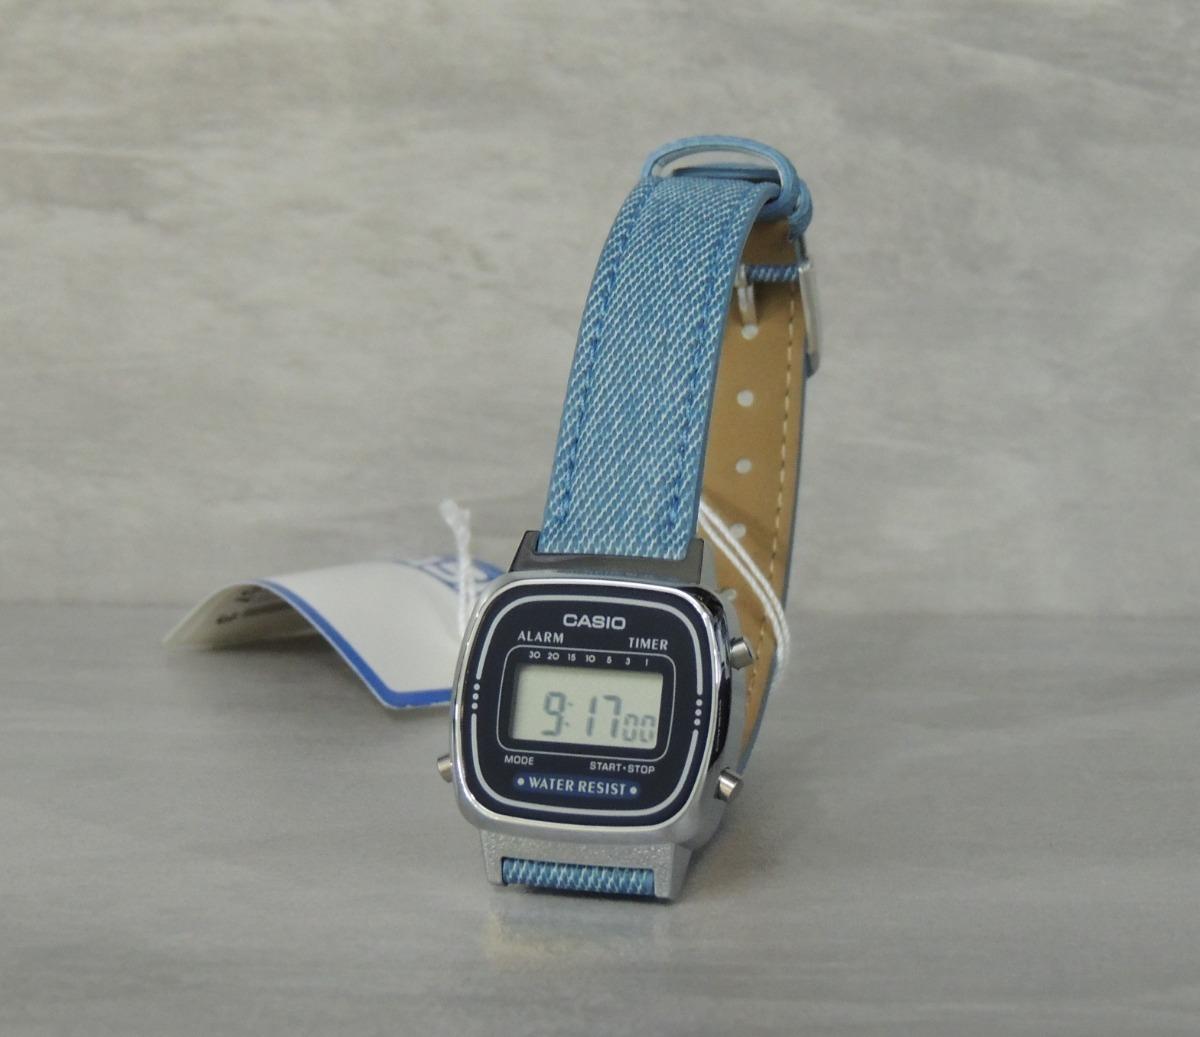 2eab71b7ca3 relógio casio vintage mini jeans la670wl-2a2df (nf garantia). Carregando  zoom.